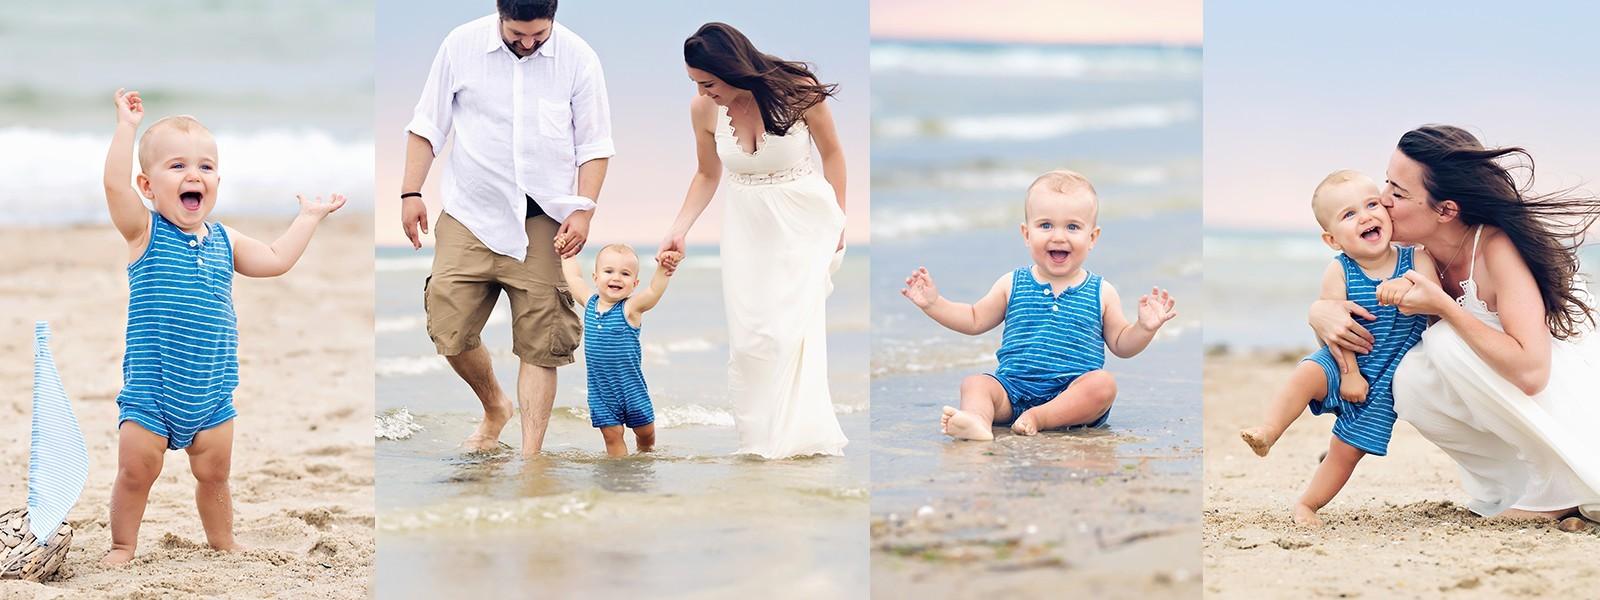 Sarah Zollo Family Beach Portrait